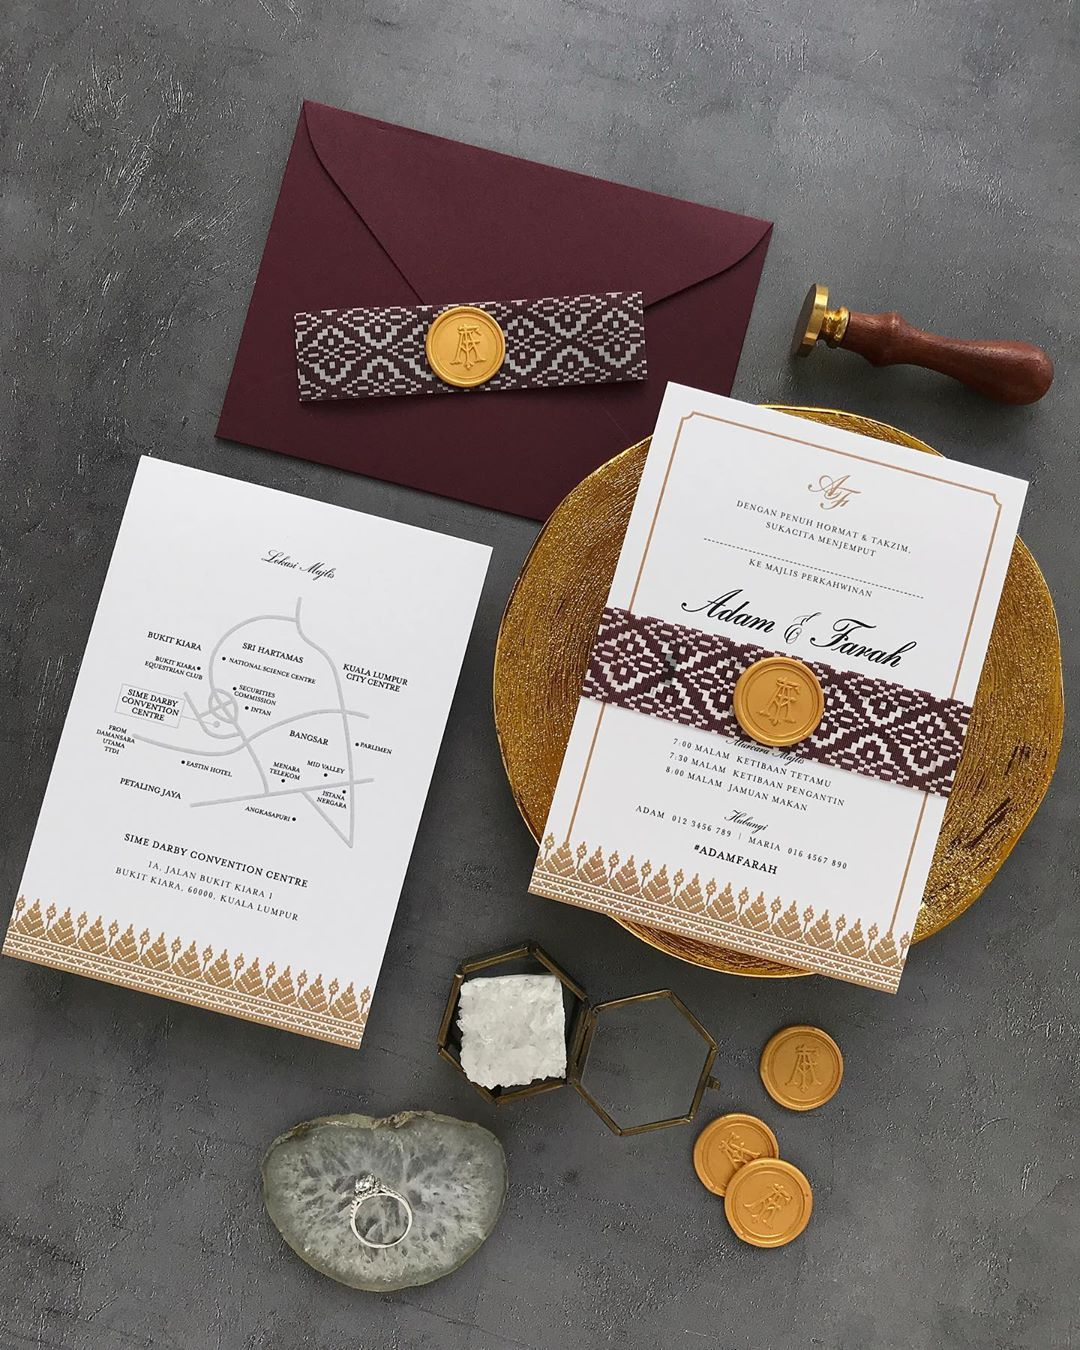 Kad Kahwin Wedding Invitations On Instagram Timeless Songket When Minimalist Meets Traditionalist Kad Kahwin Wedding Invitations Kad Kahwin Design